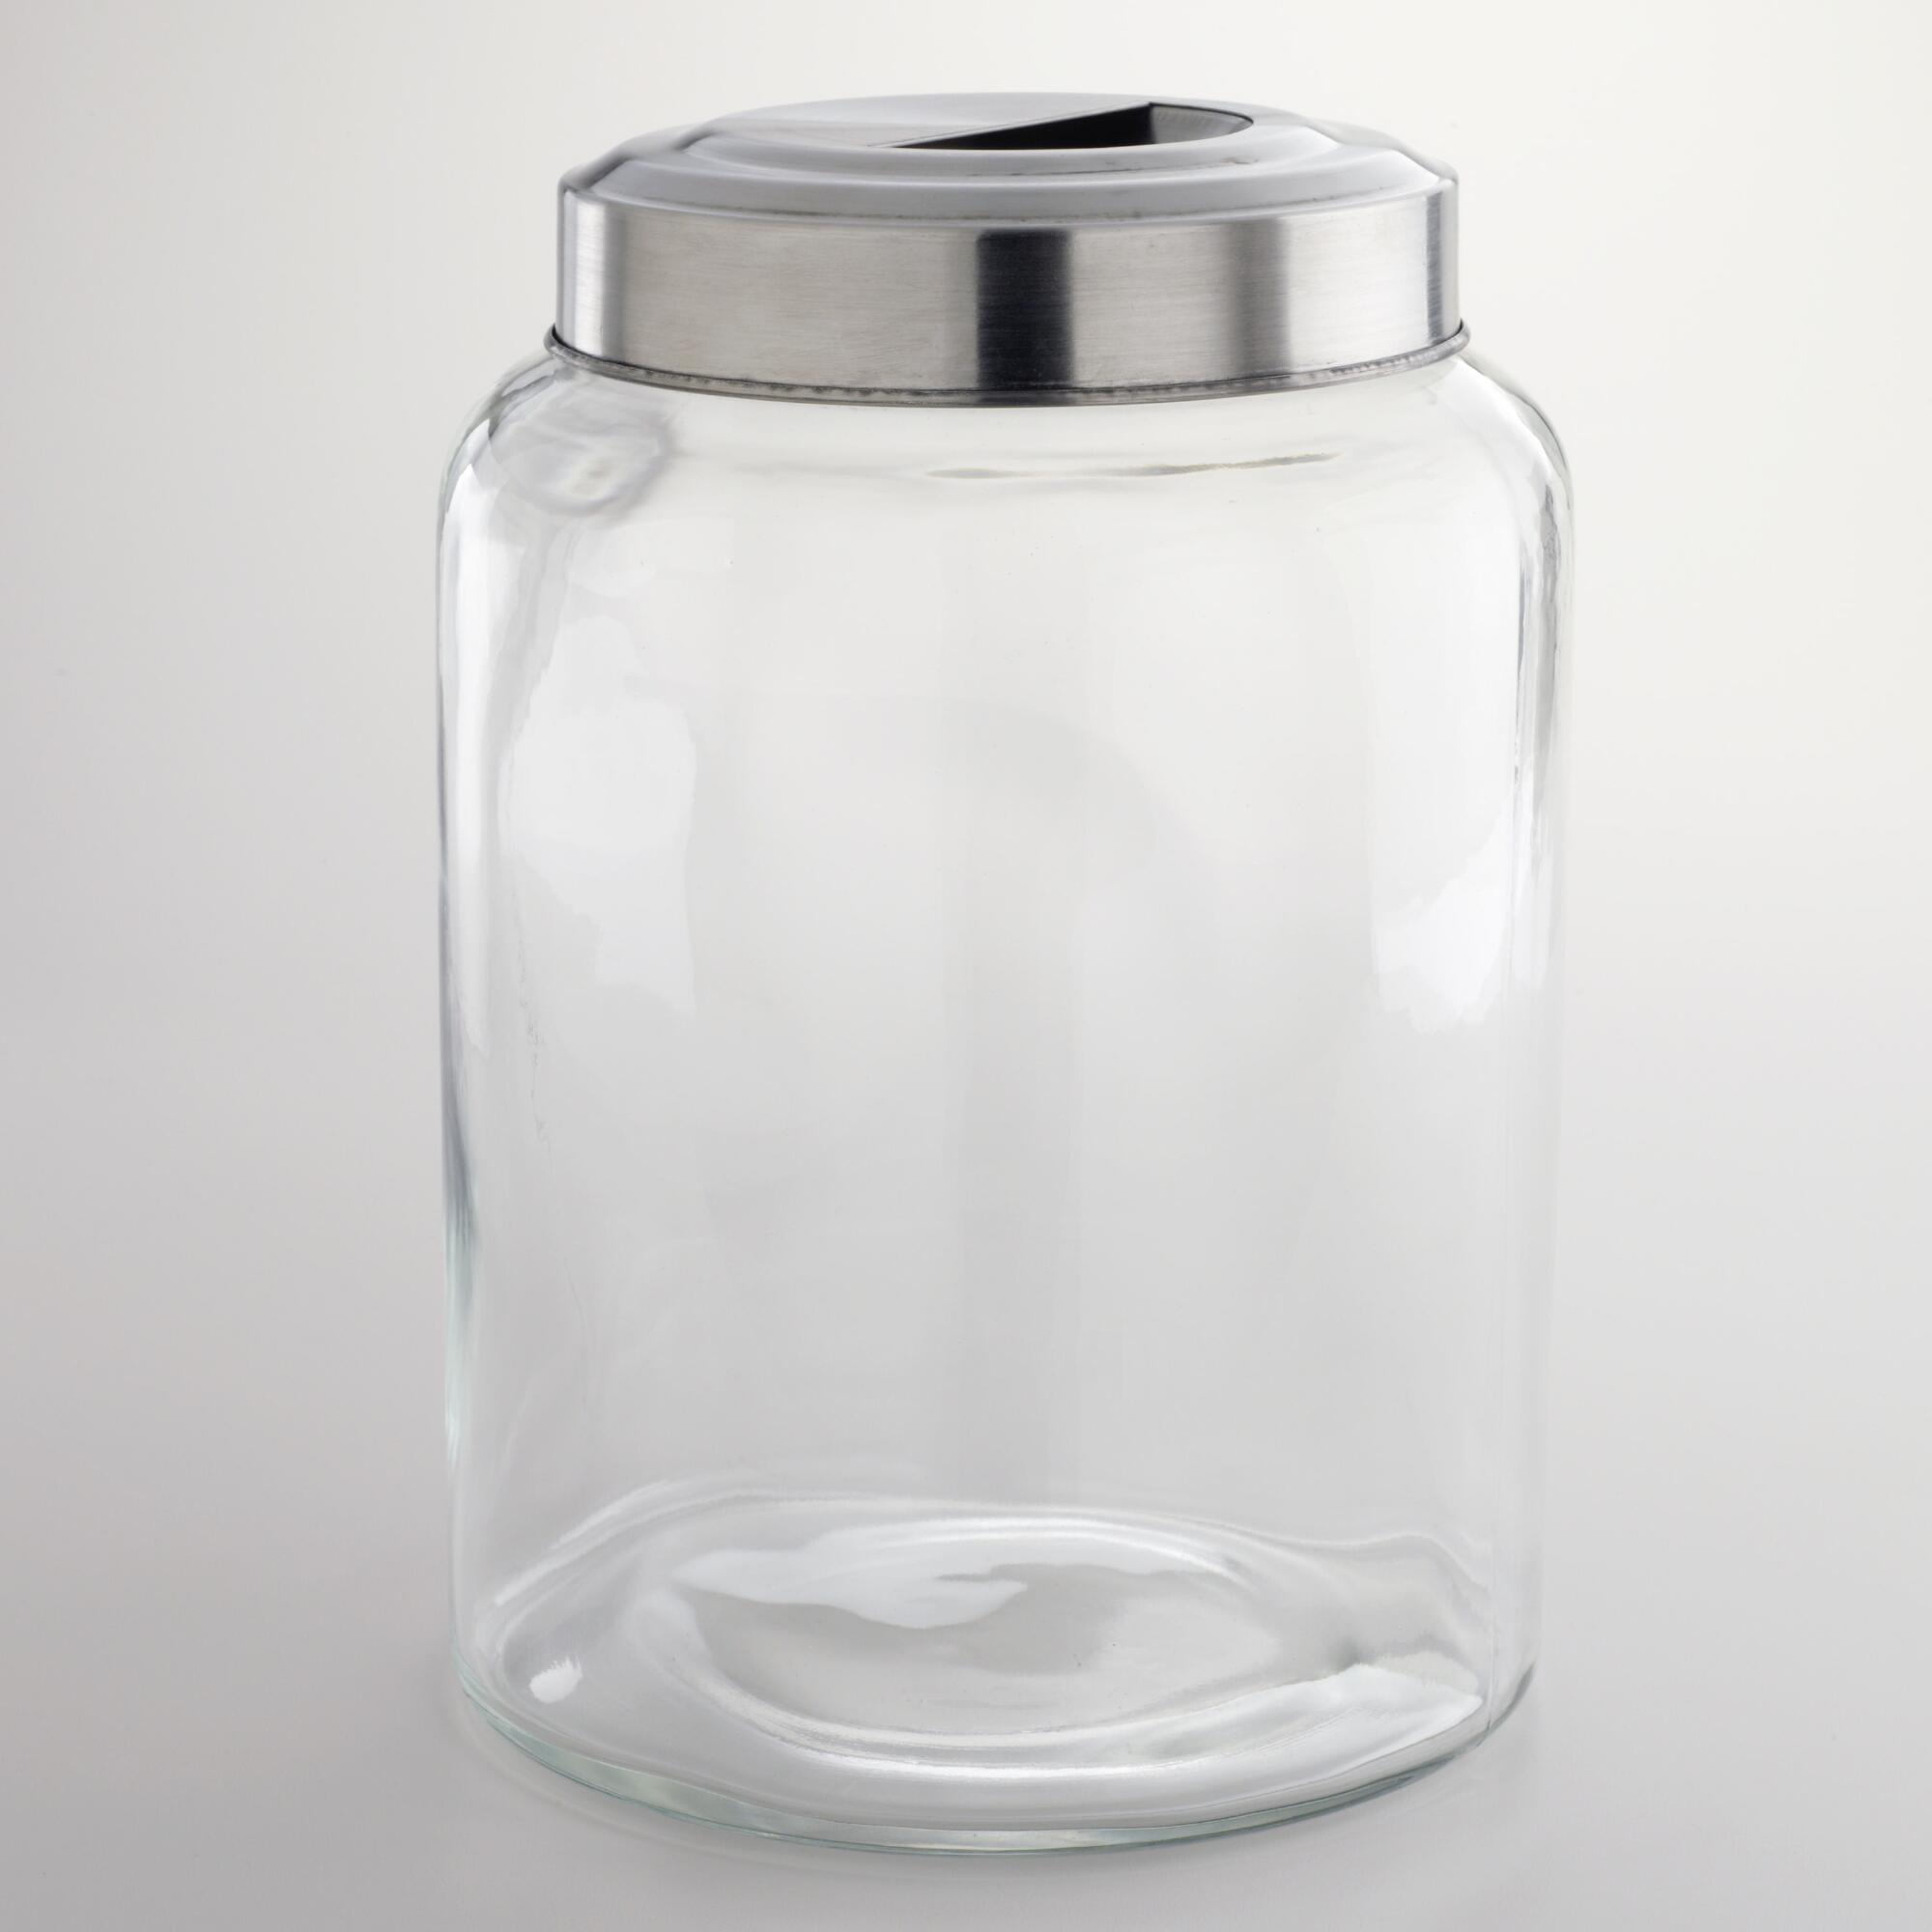 Large Glass Kitchen Jar Kitchen Jars Glass Jars Glass Kitchen